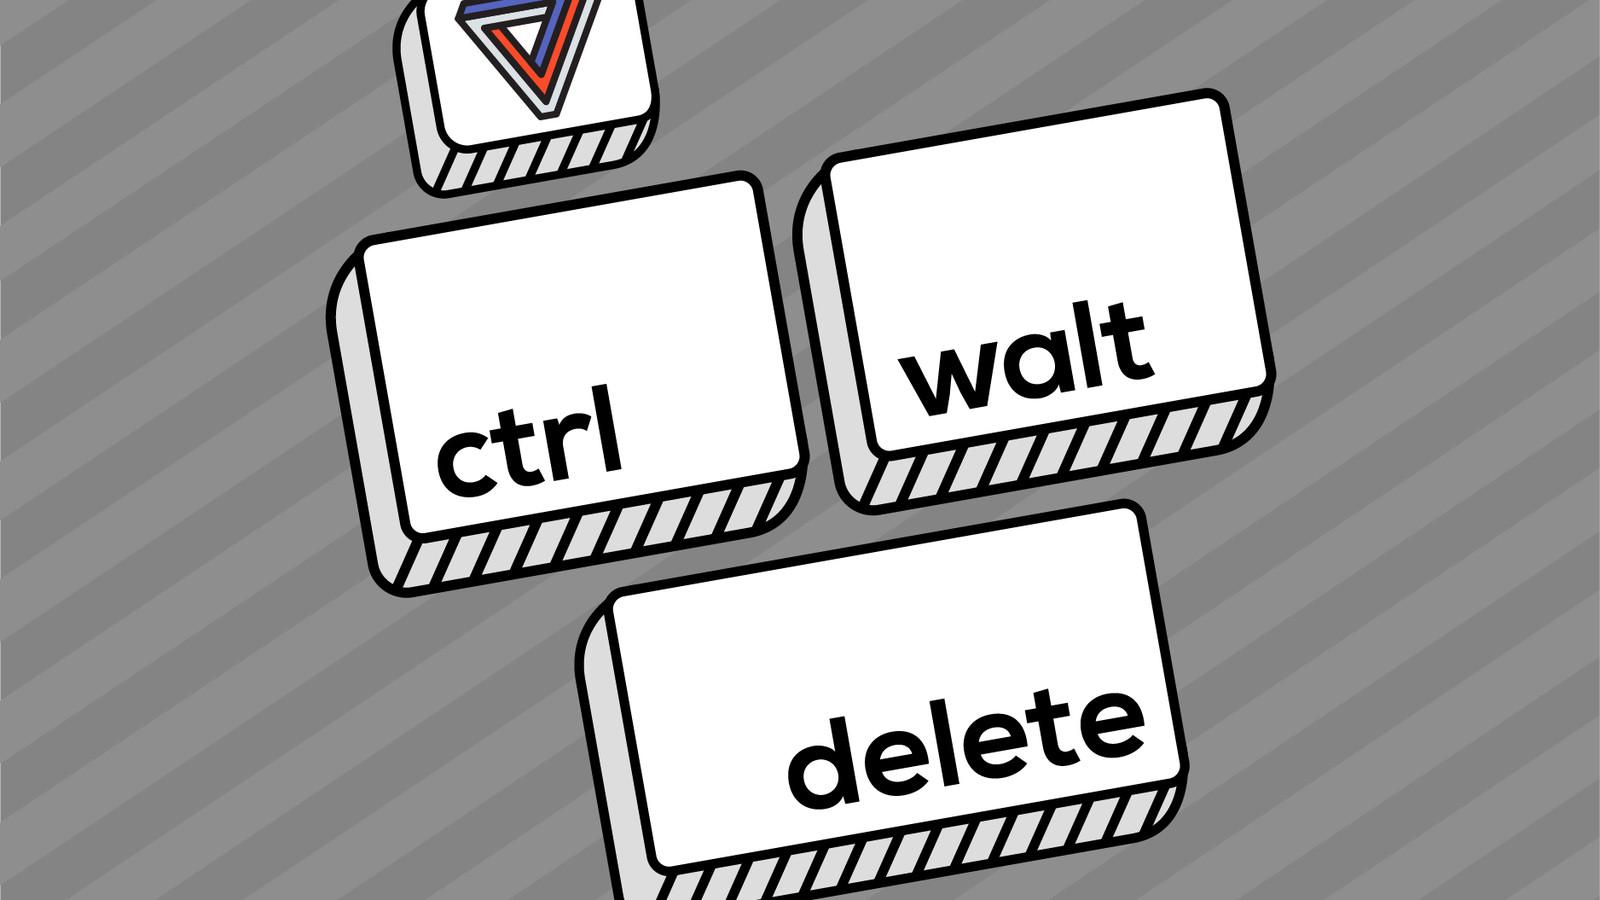 Ctrl-Walt-Delete: our last in-studio show